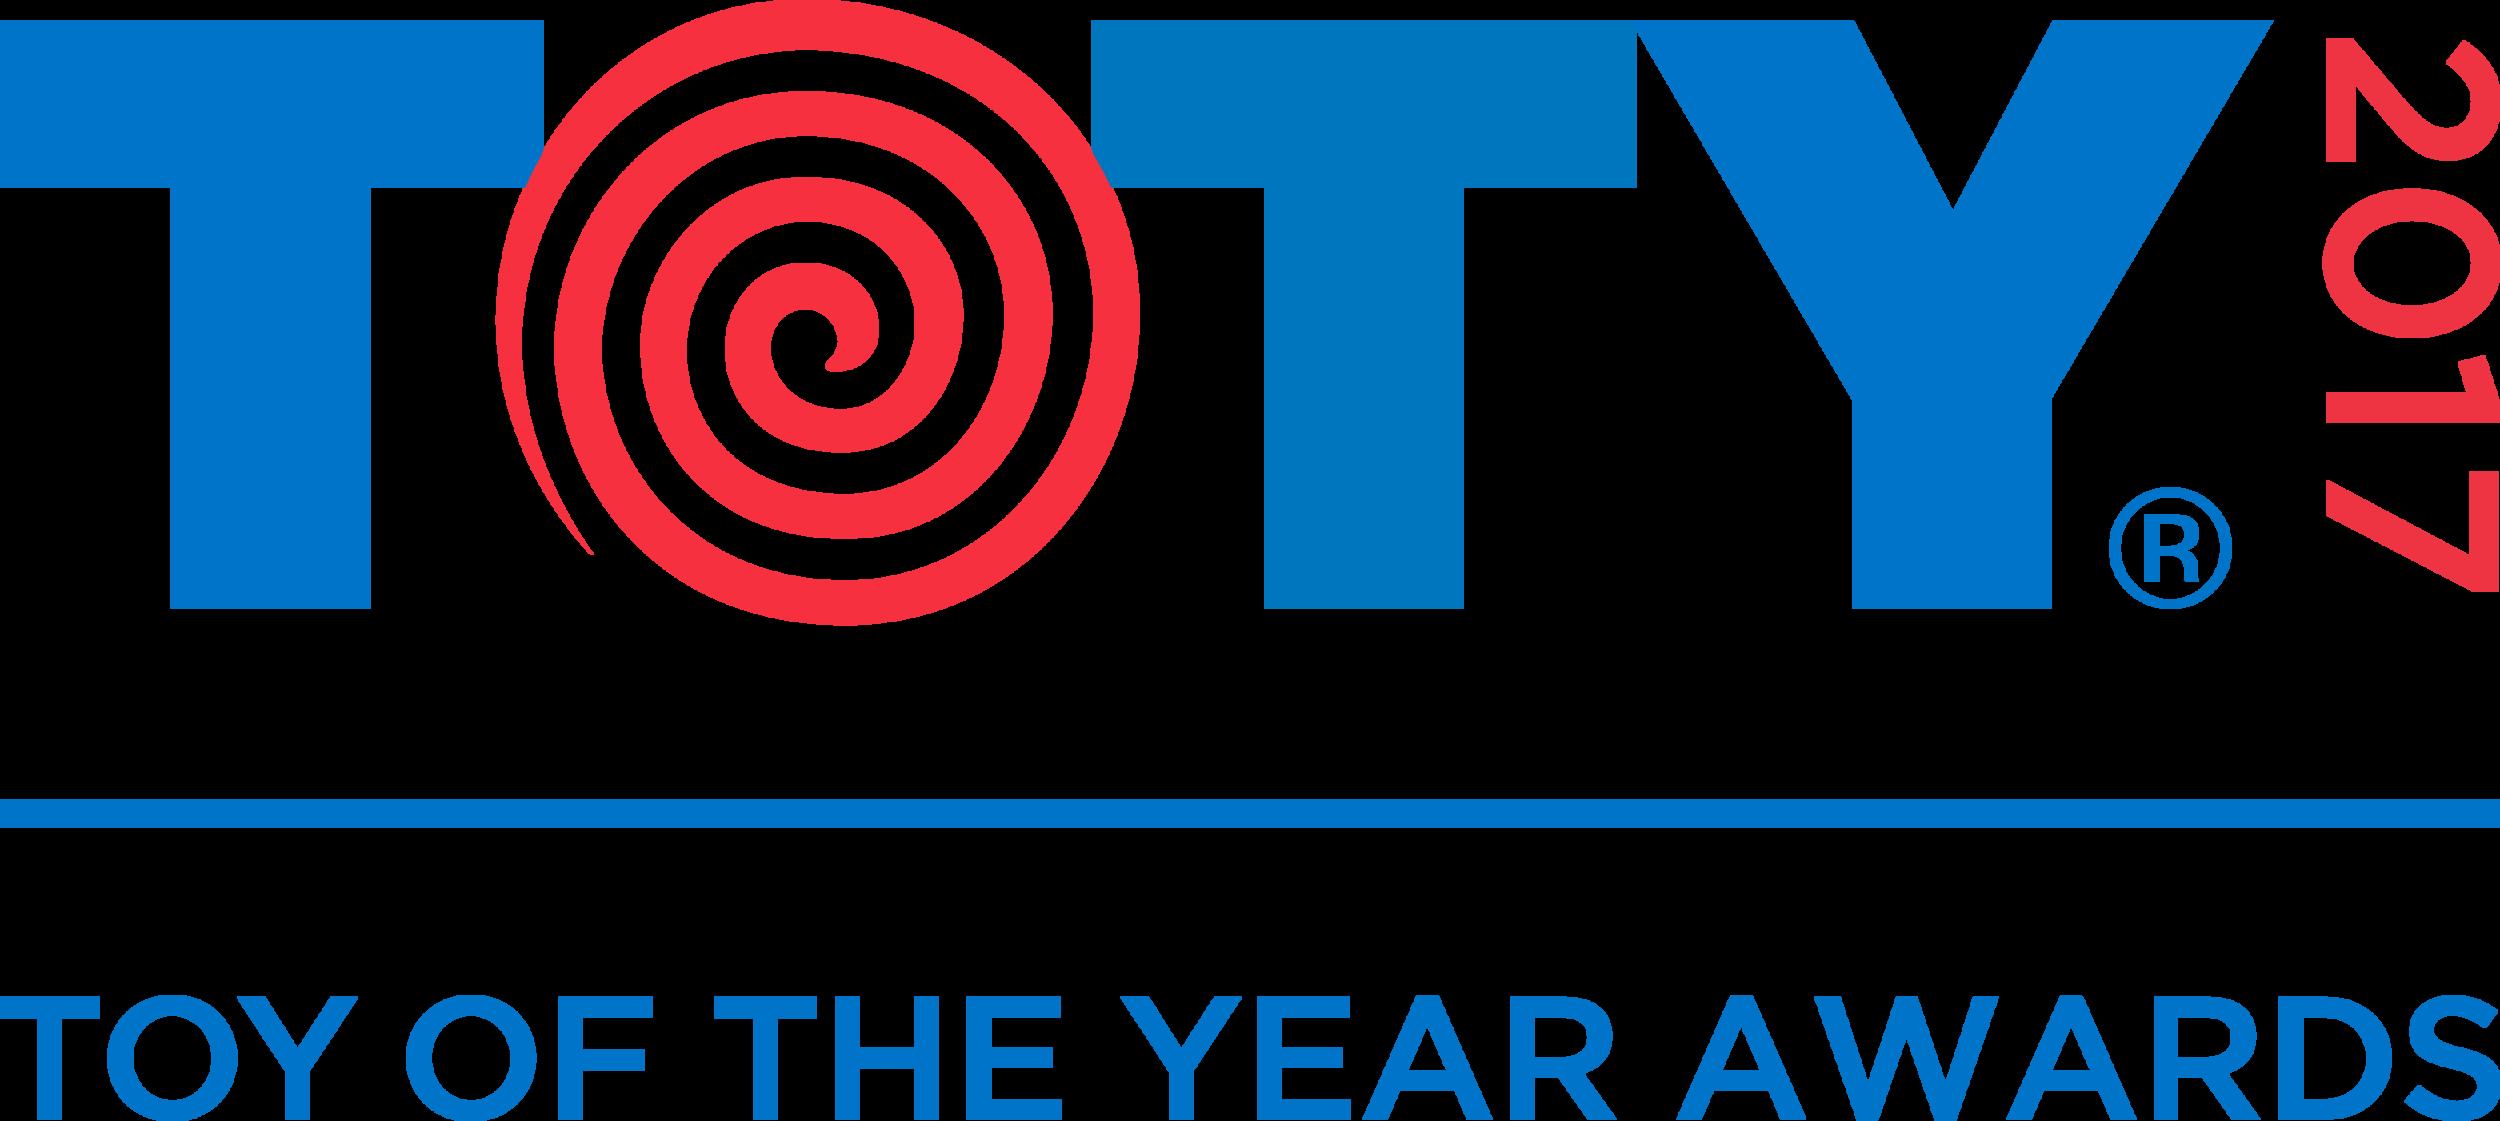 TOTY16-logo.png